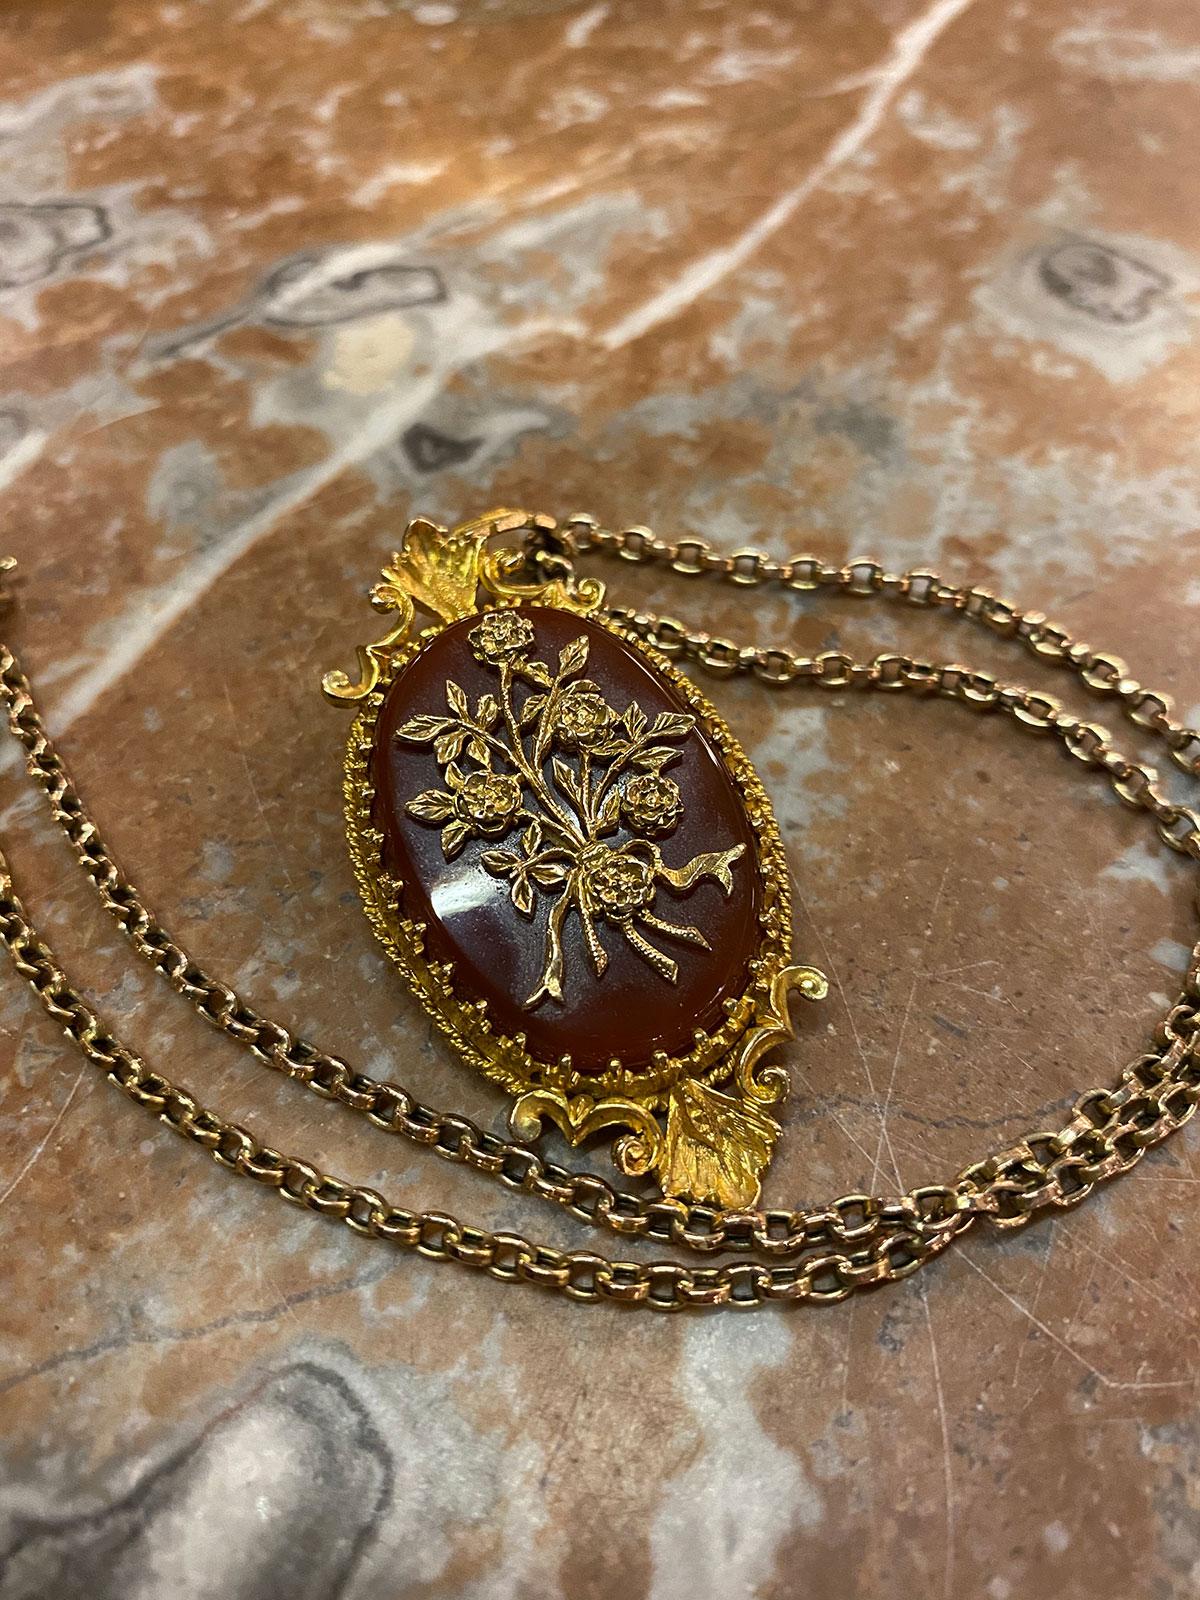 9ct Gold & Cornelian Pendant & 9ct Gold Chain